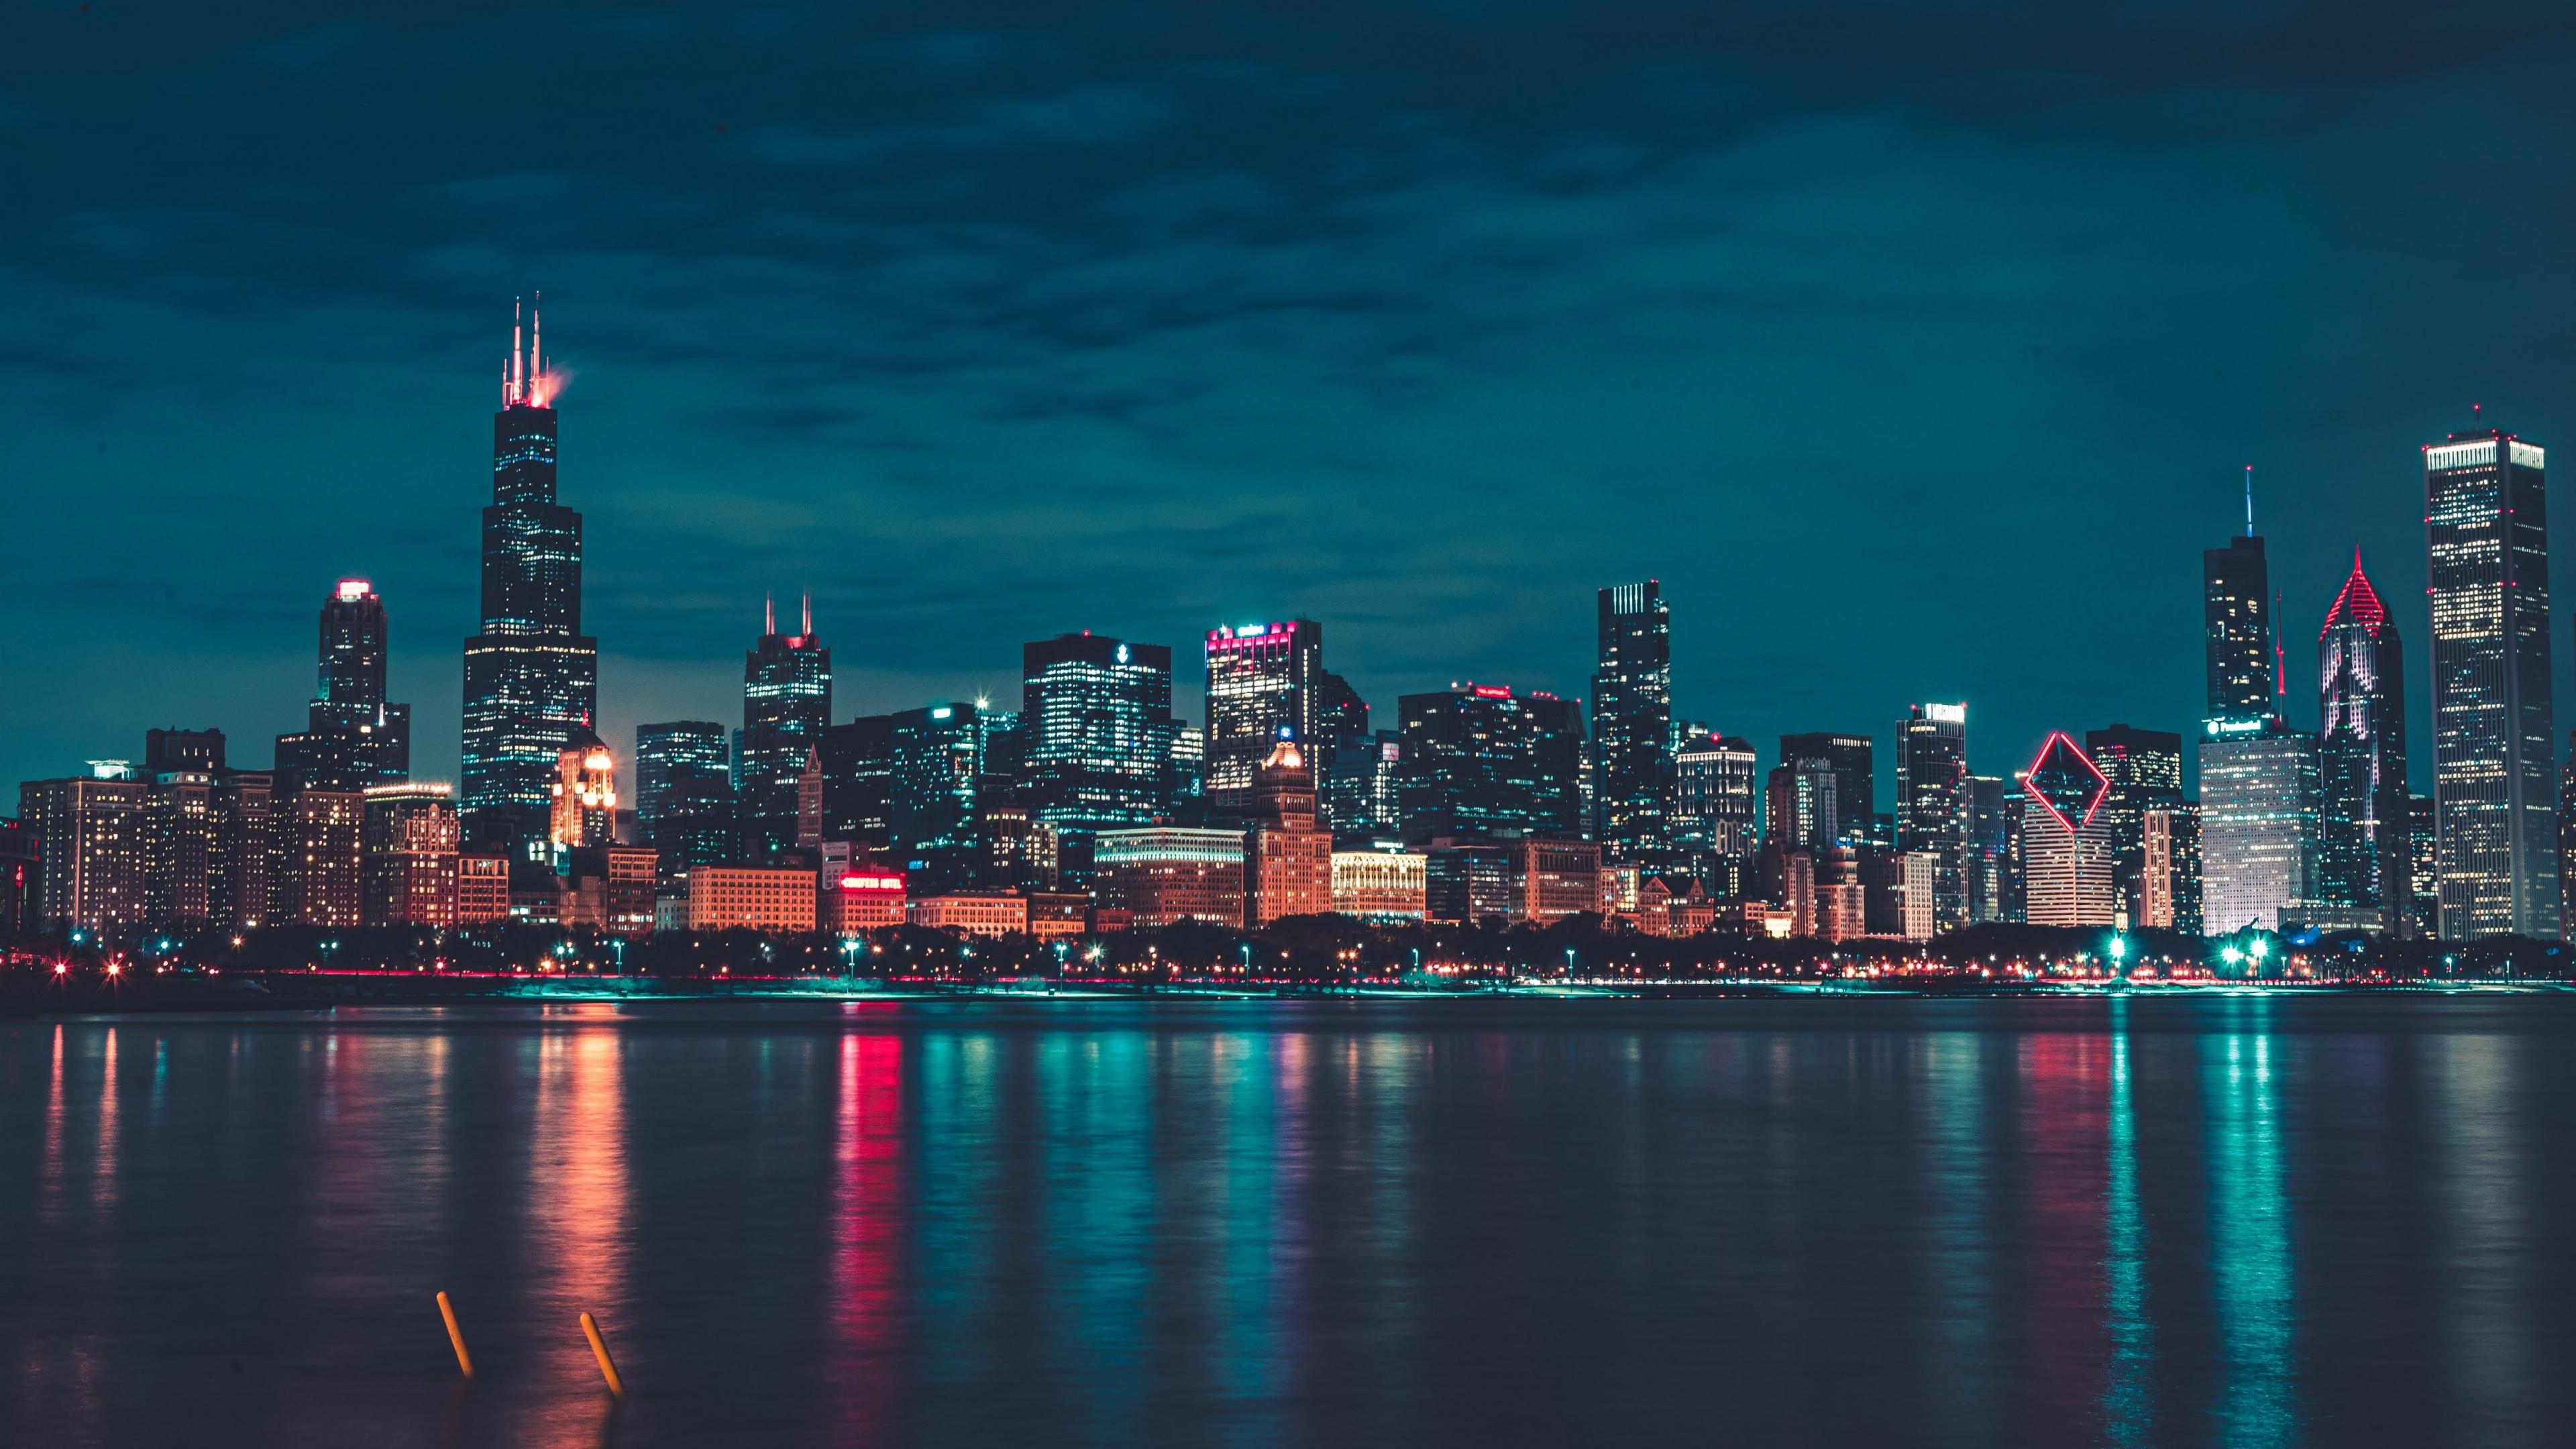 Chicago 4k Wallpaper Night City Lights Cityscape Reflections Skyline 5k World 406